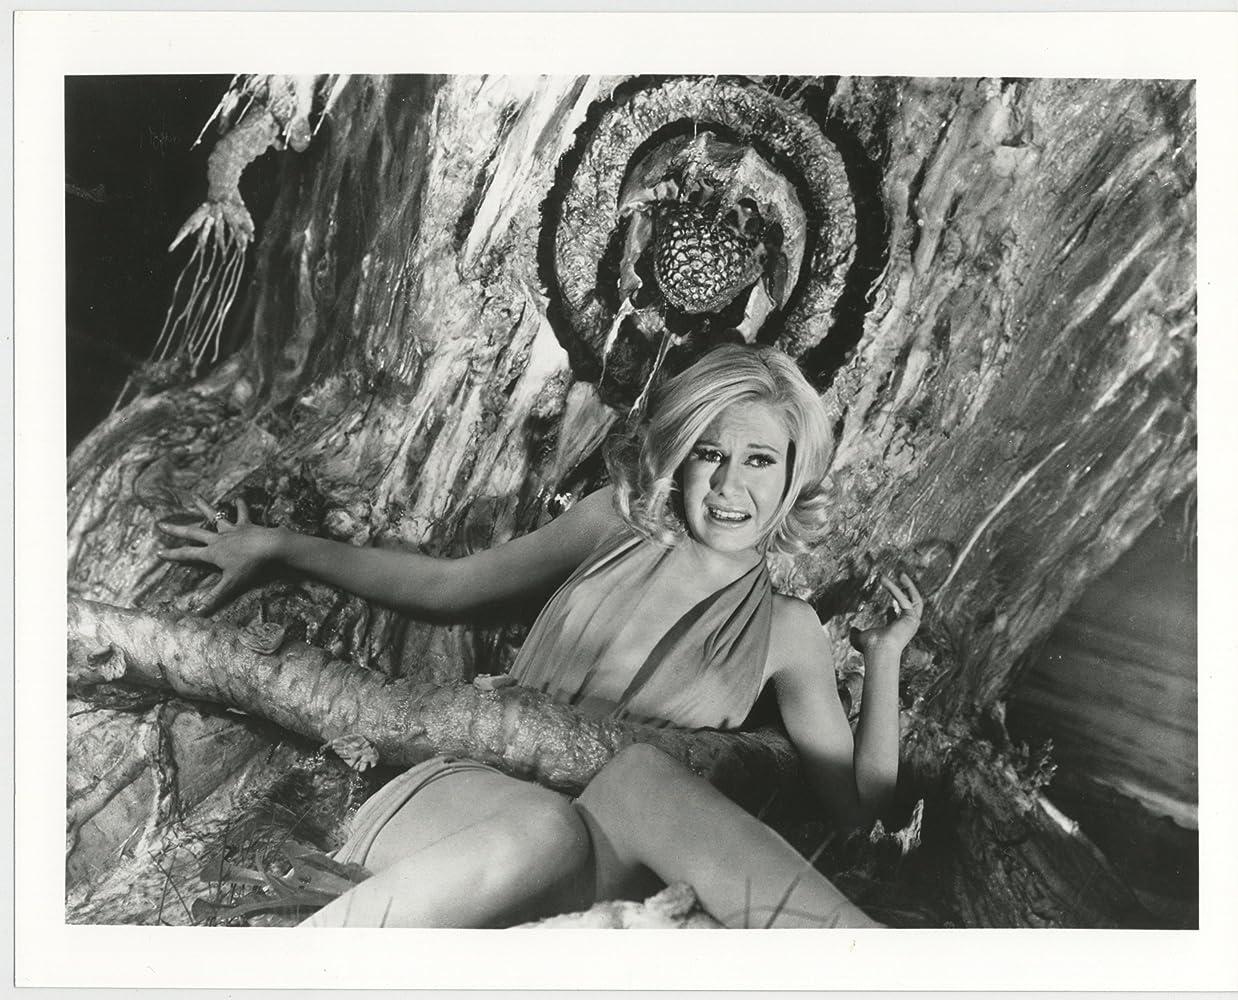 Helen Baxendale (born 1970) Adult archive Katy Brinson,Linda Loredo